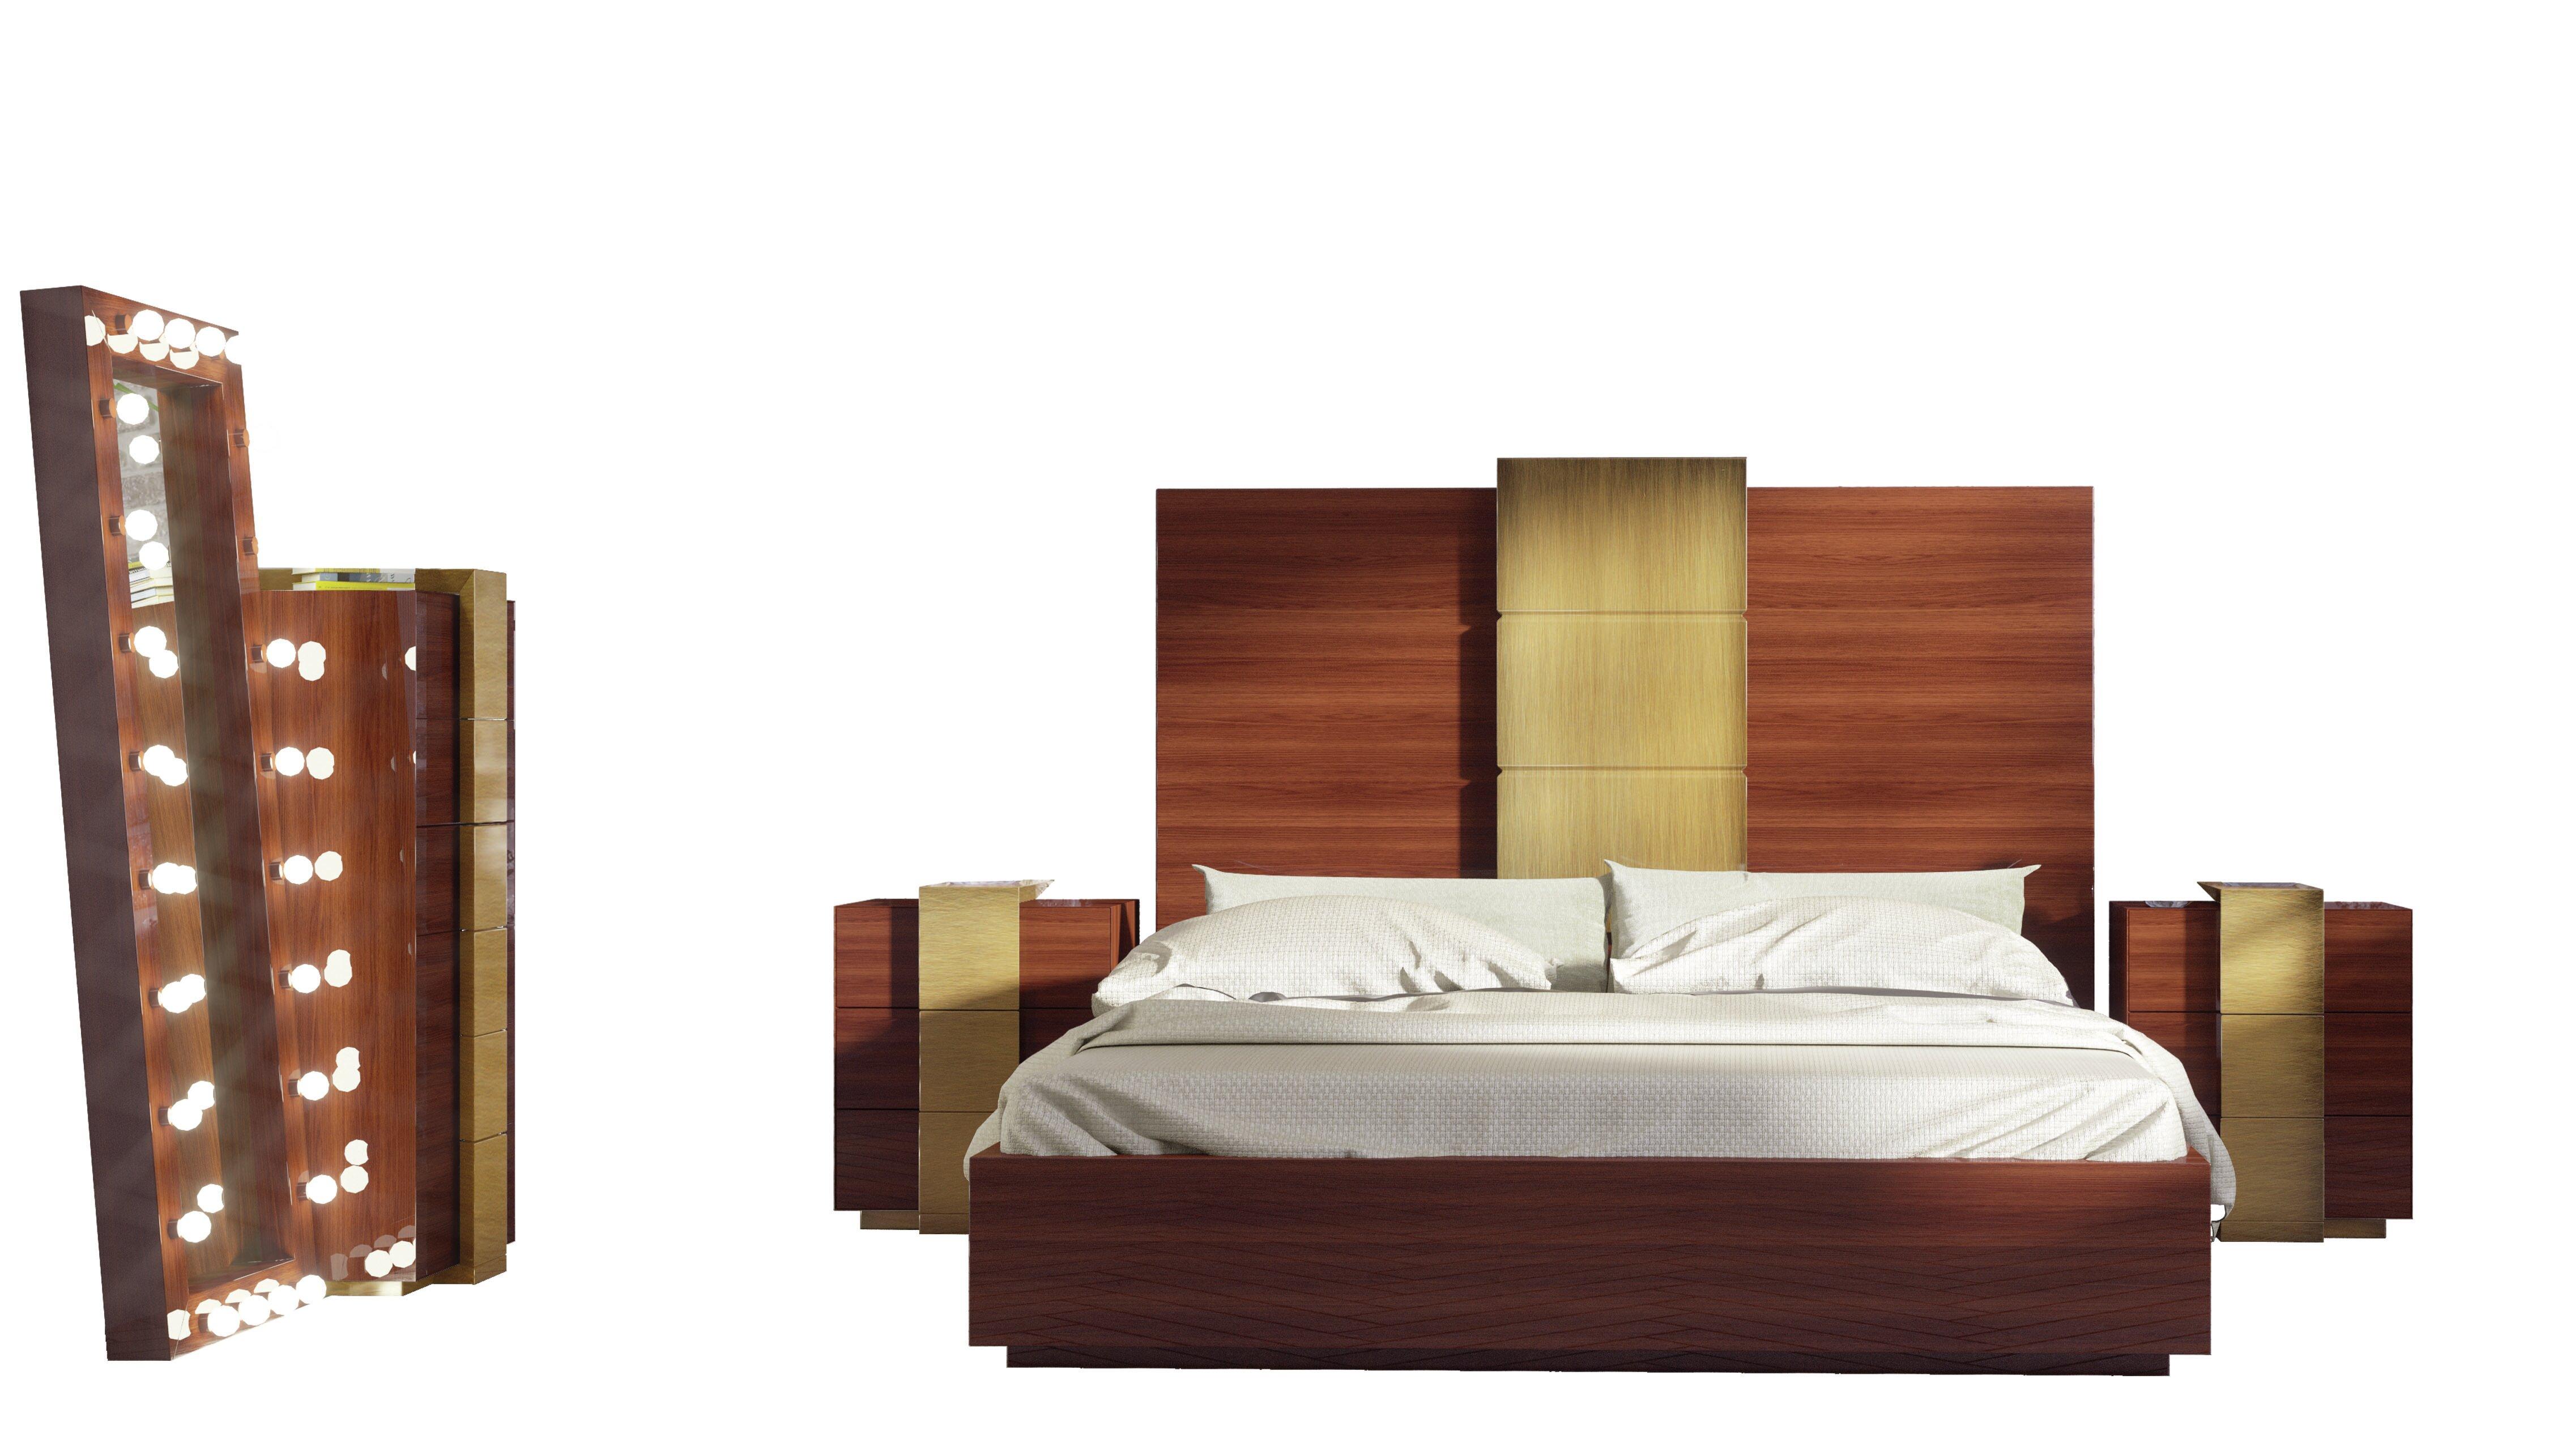 Hispania Home London Bedor13 Bedroom Set 5 Pieces Wayfair